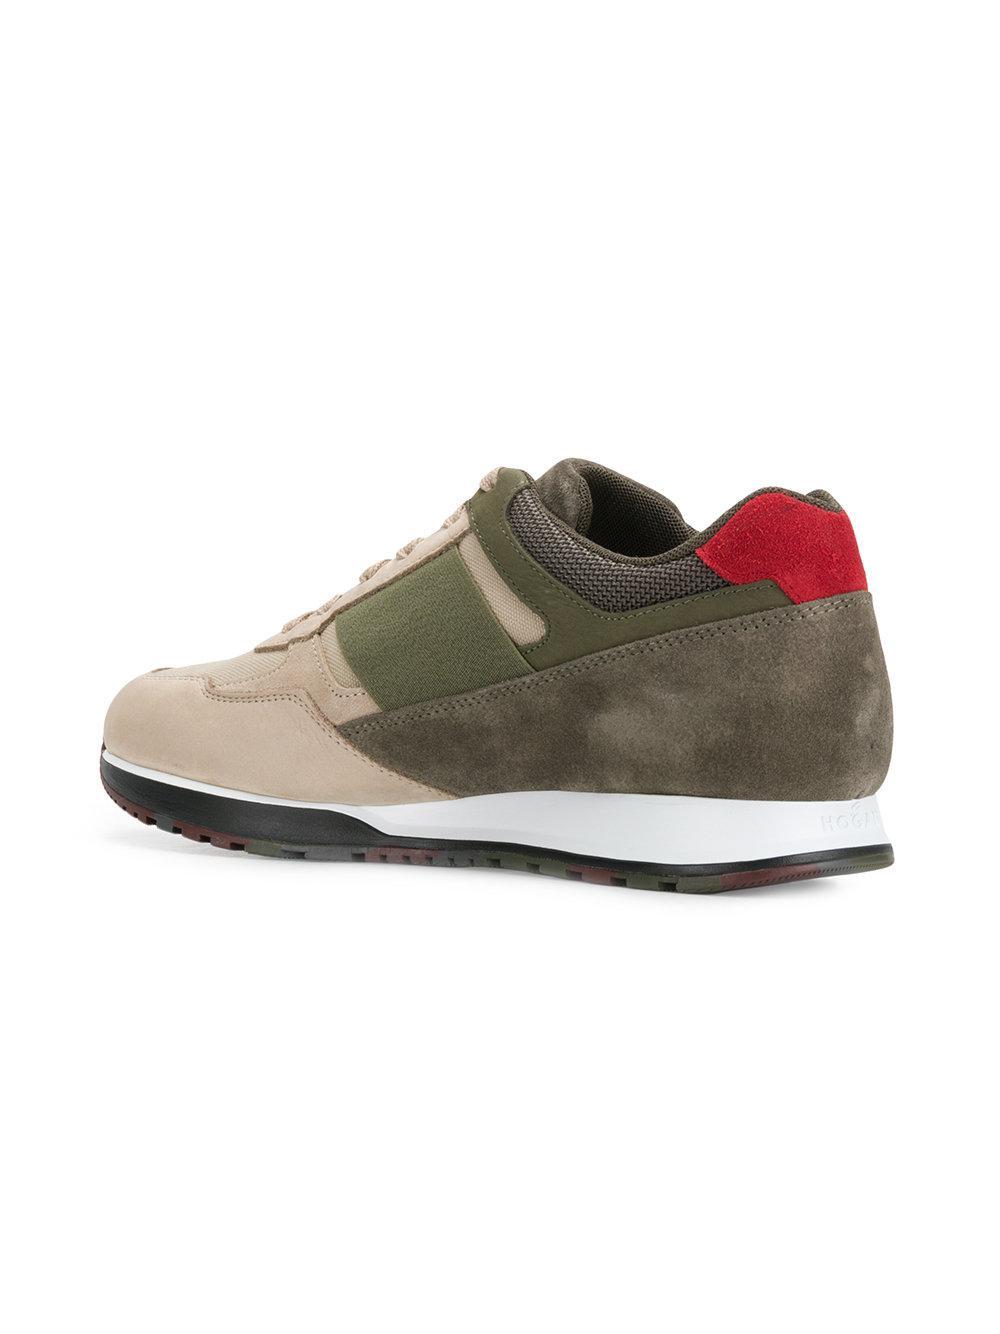 logo sneakers - Green Hogan Lv7O4DL7